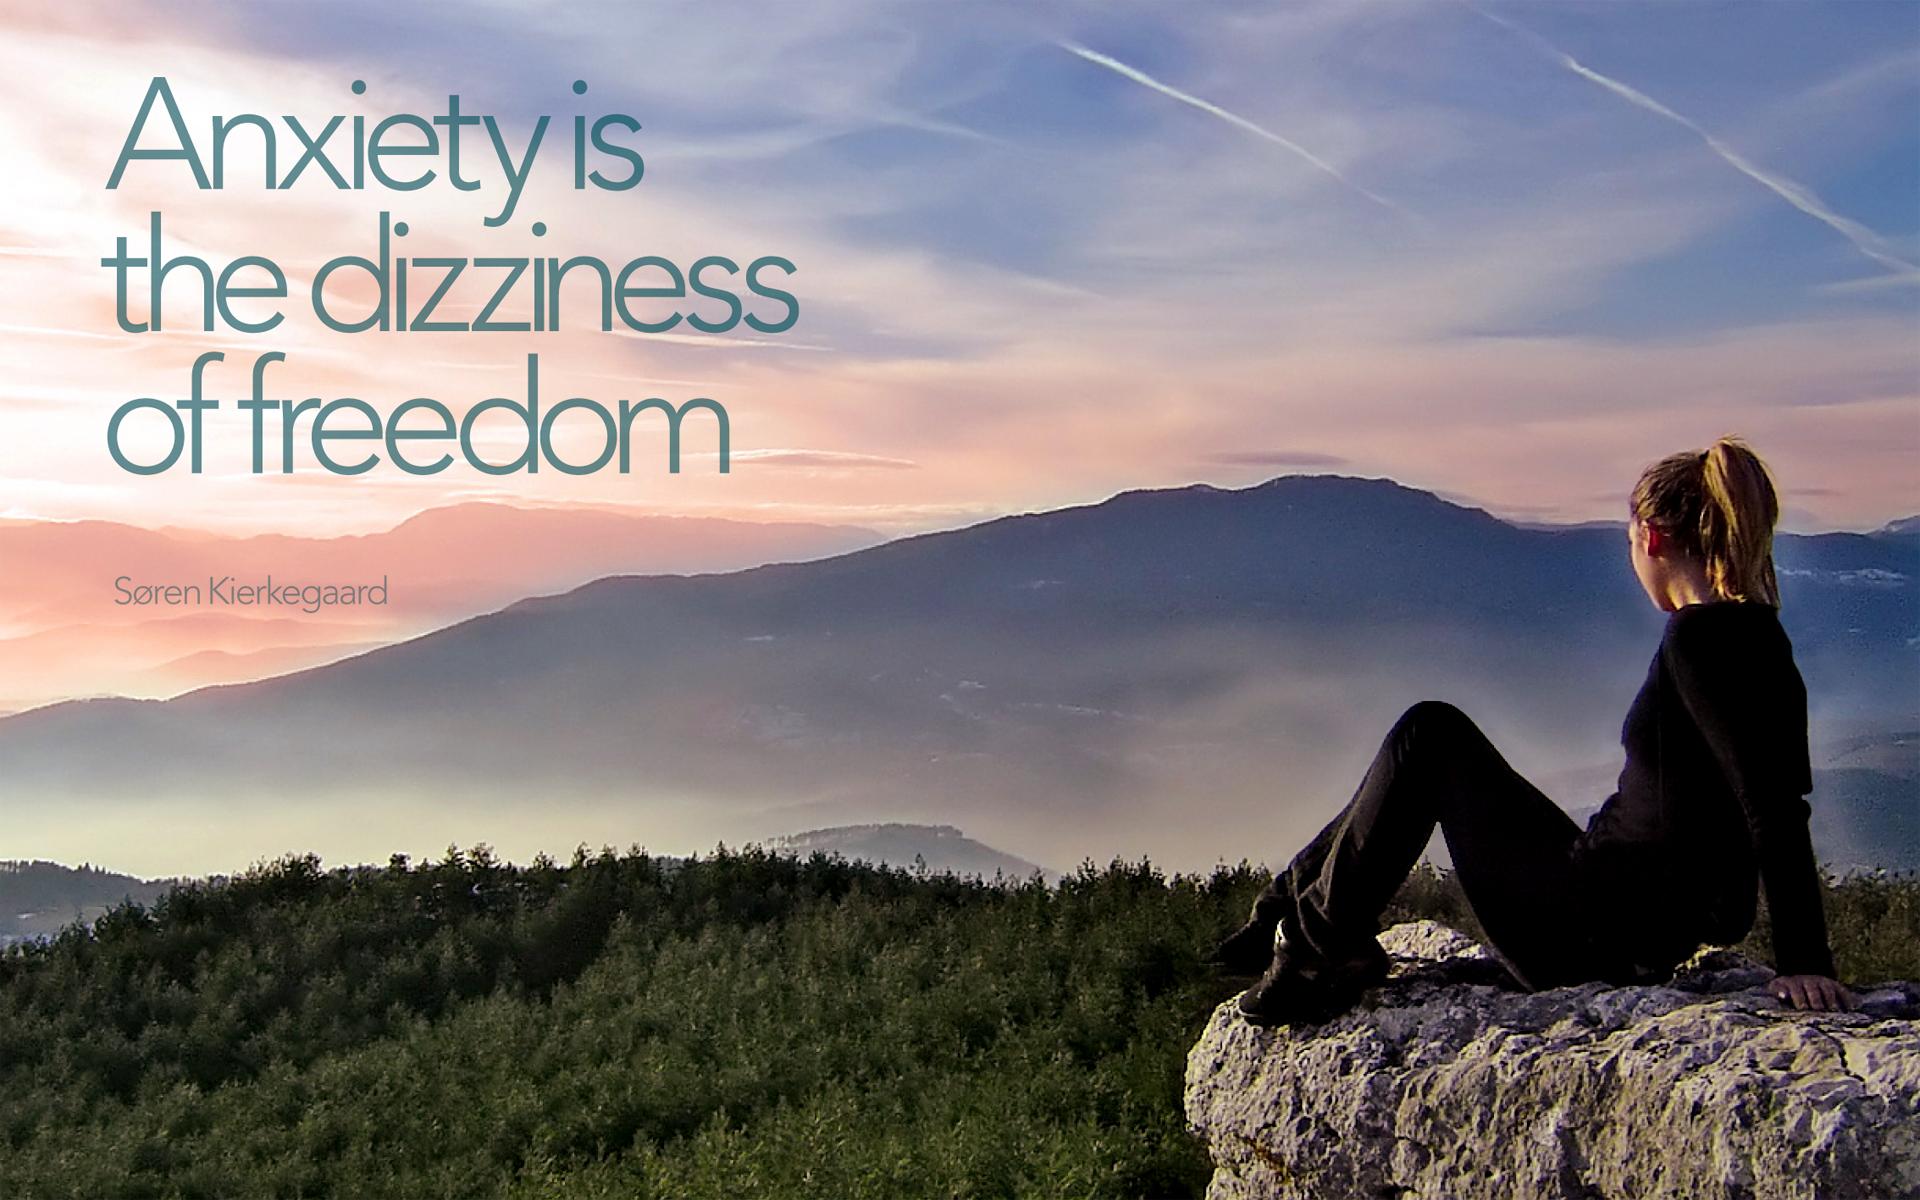 Anxiety is the dizziness of freedom. — Søren Kierkegaard [1920×1200]